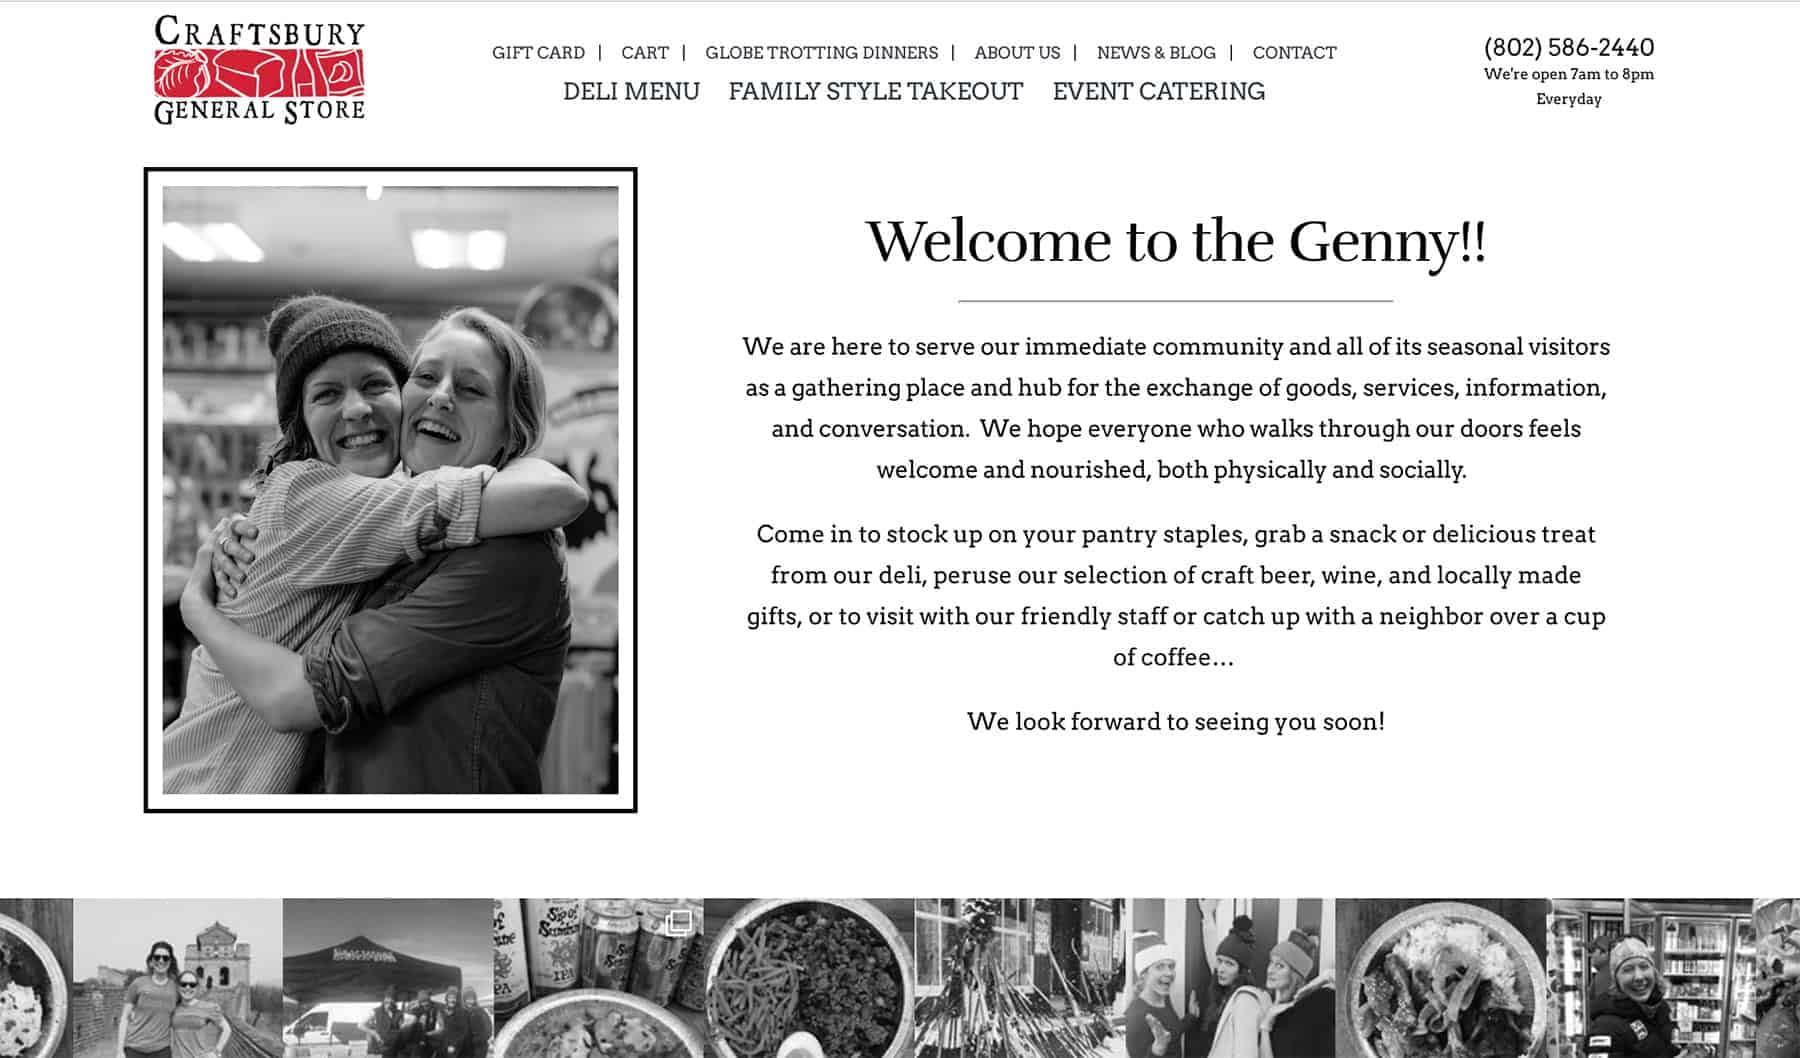 Screenshot of the Craftsbury General Store Homepage